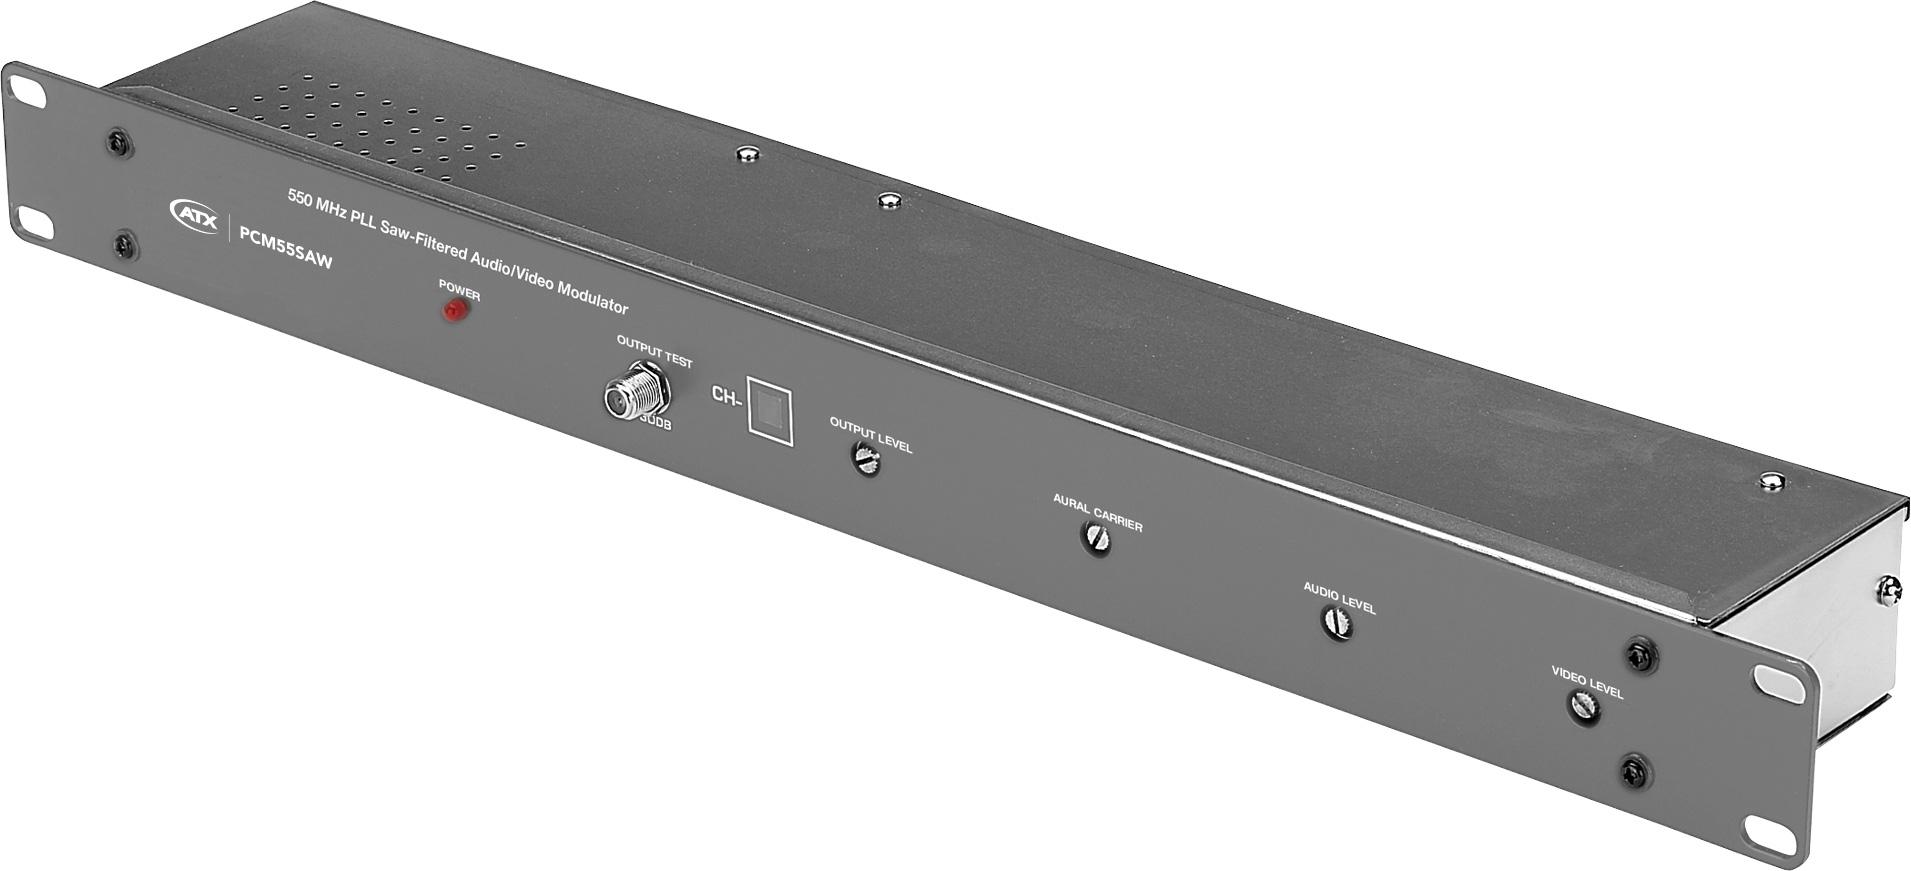 1 Channel Crystal A/V Modulator - Channel 99 - Freq 115.25 MHz PM-PCM55SAW-99